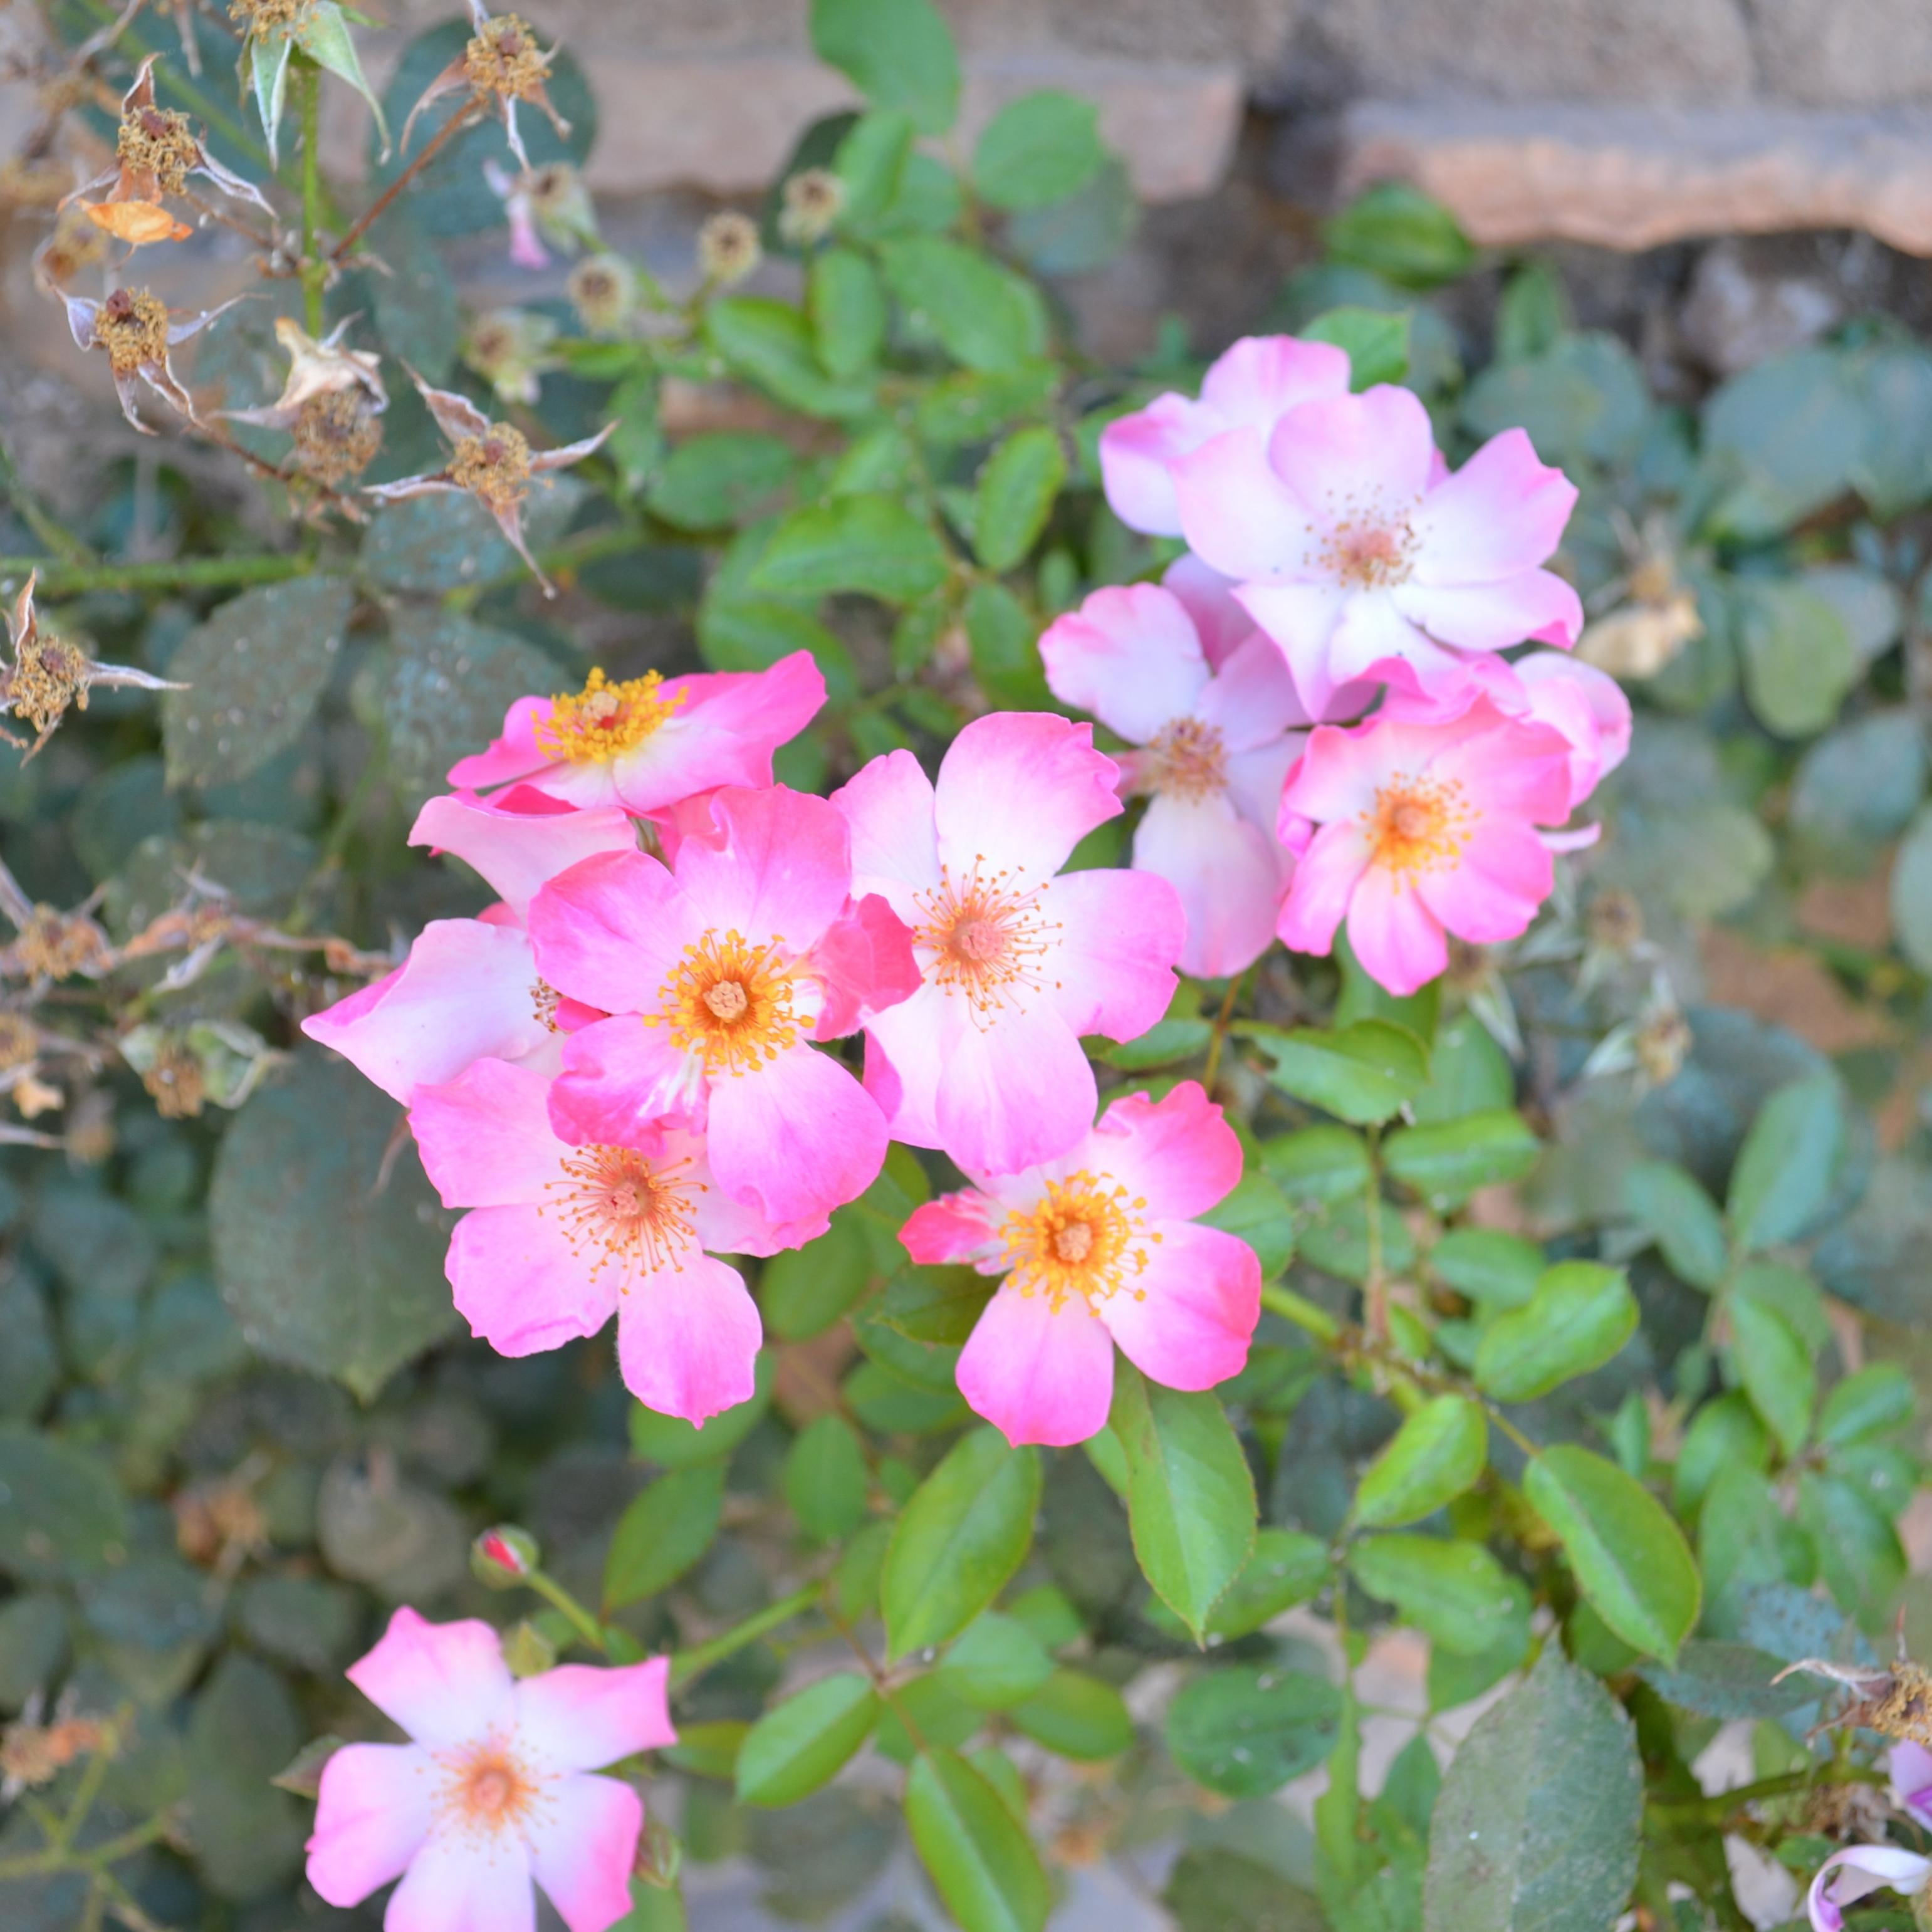 flowers - full color